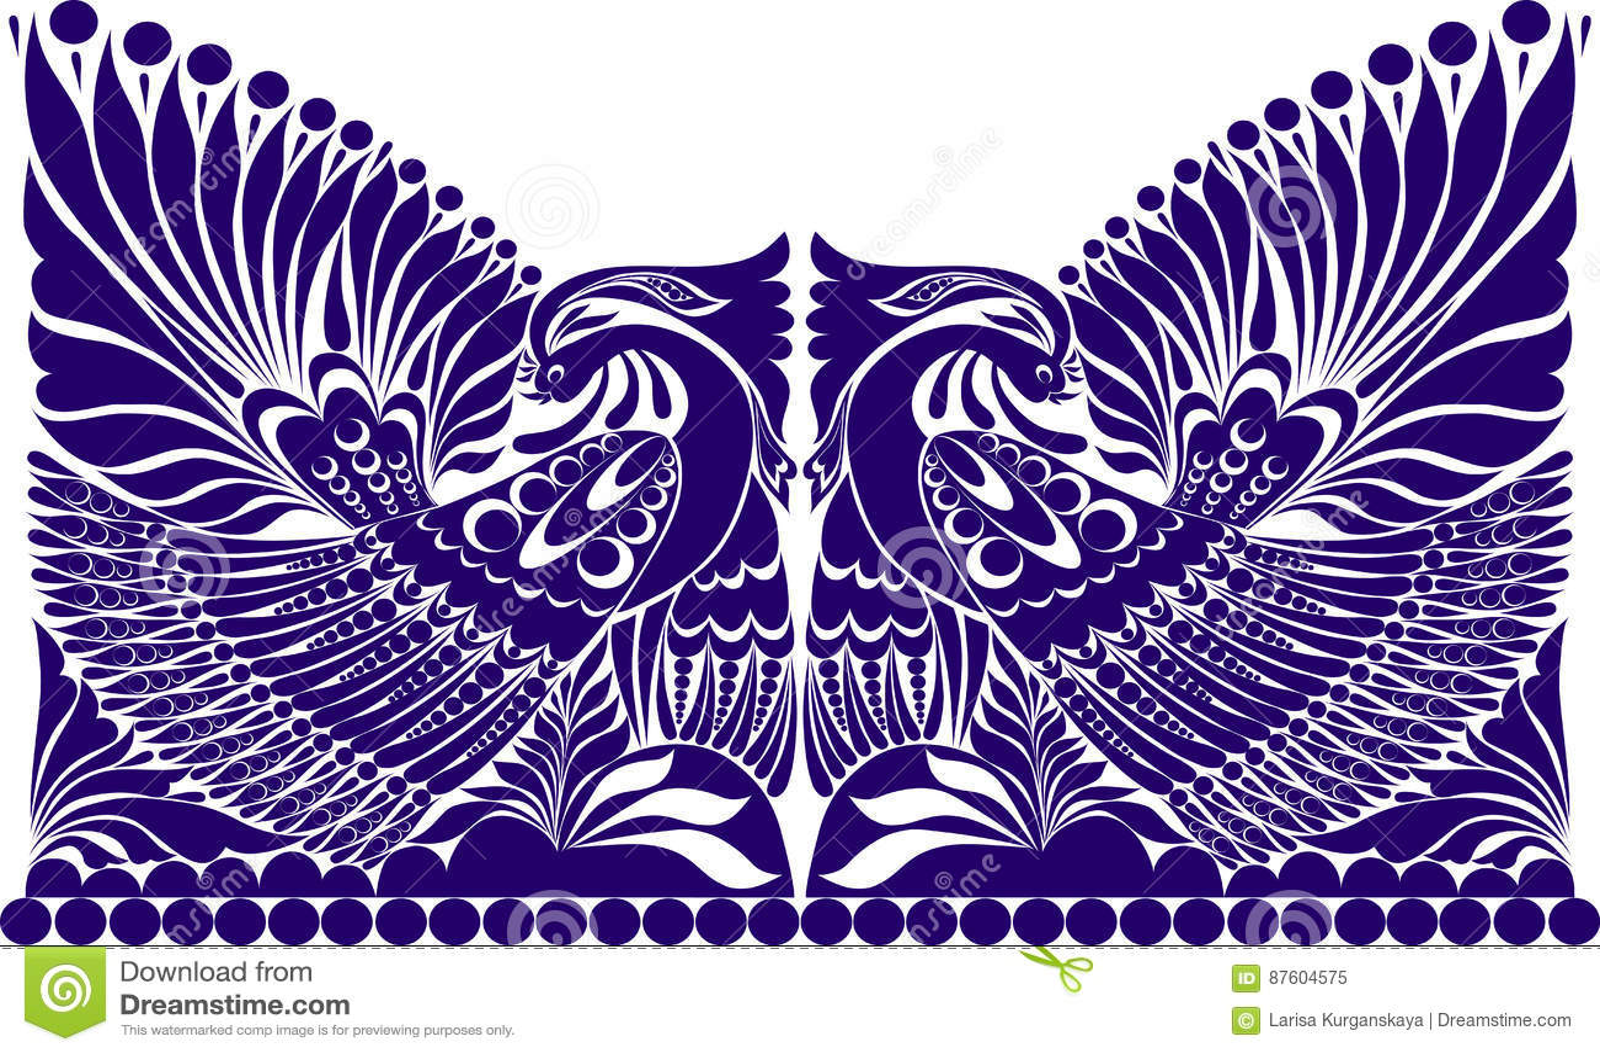 Tatoegerings Russisch ornament folkloreornament met vogel